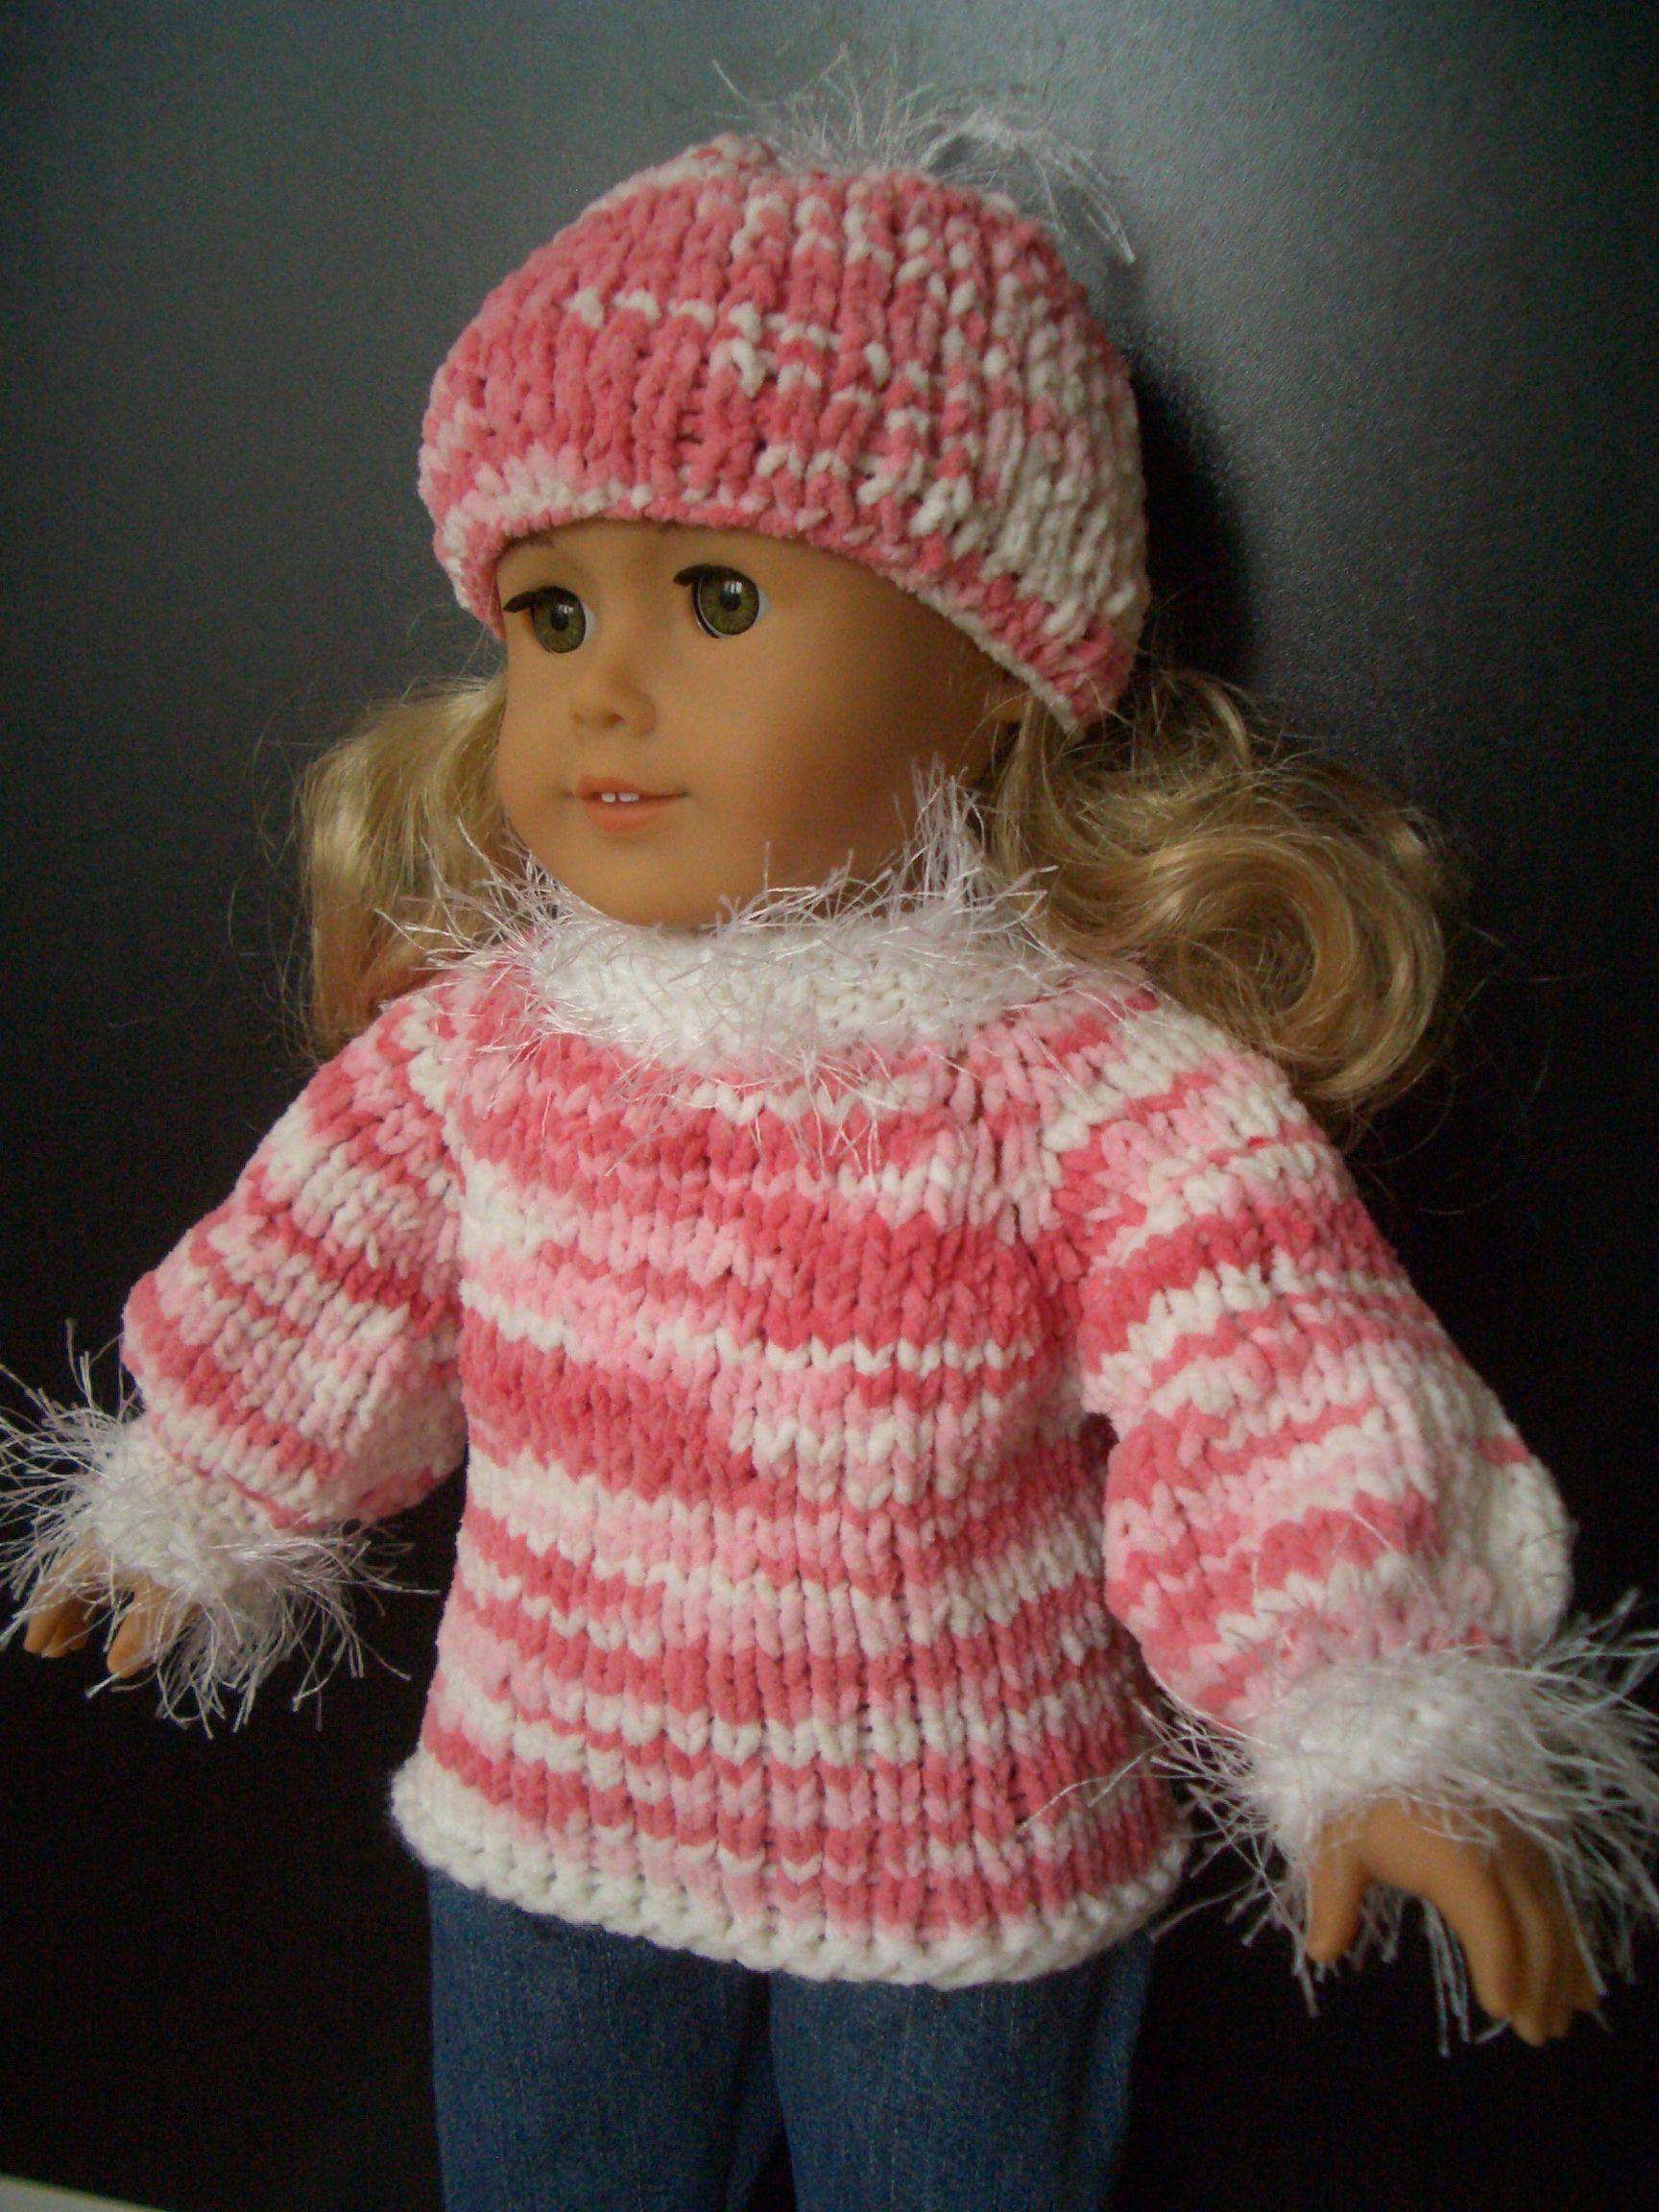 chenille yarn is one of my favorites | usefull | Pinterest | Yarns ...